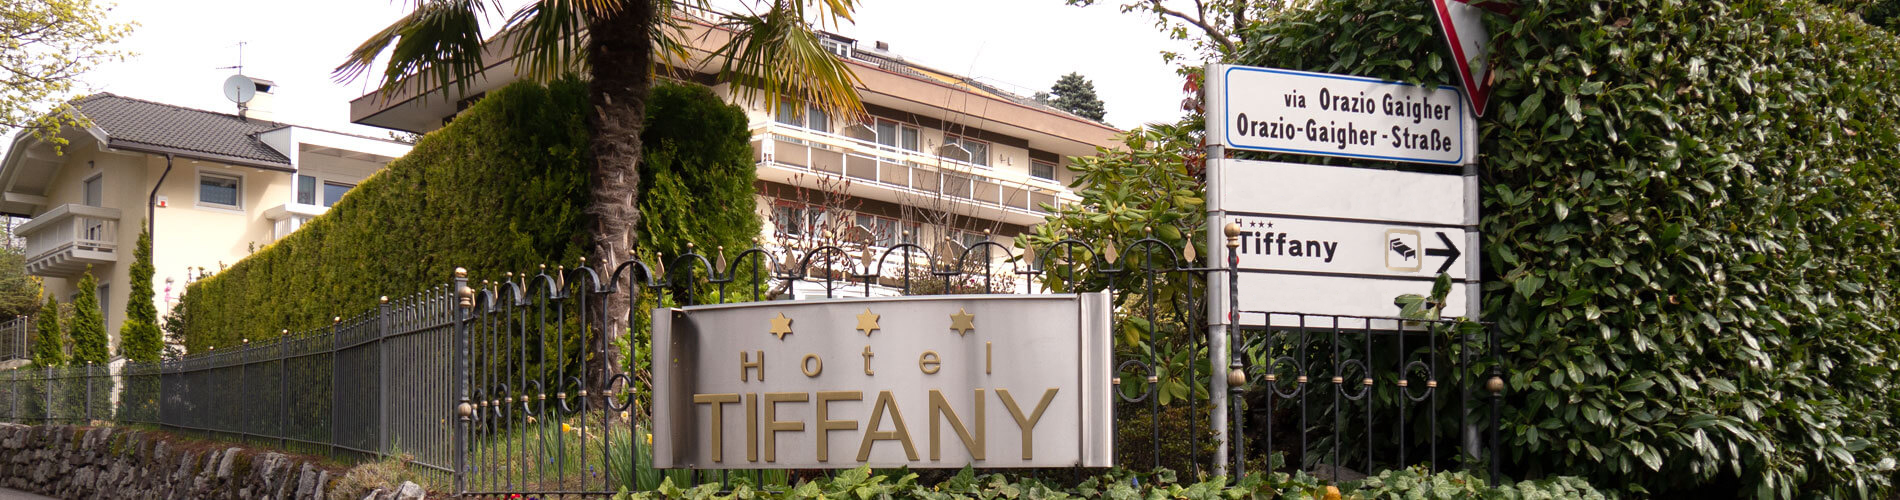 tiffany-aussen-07.jpg